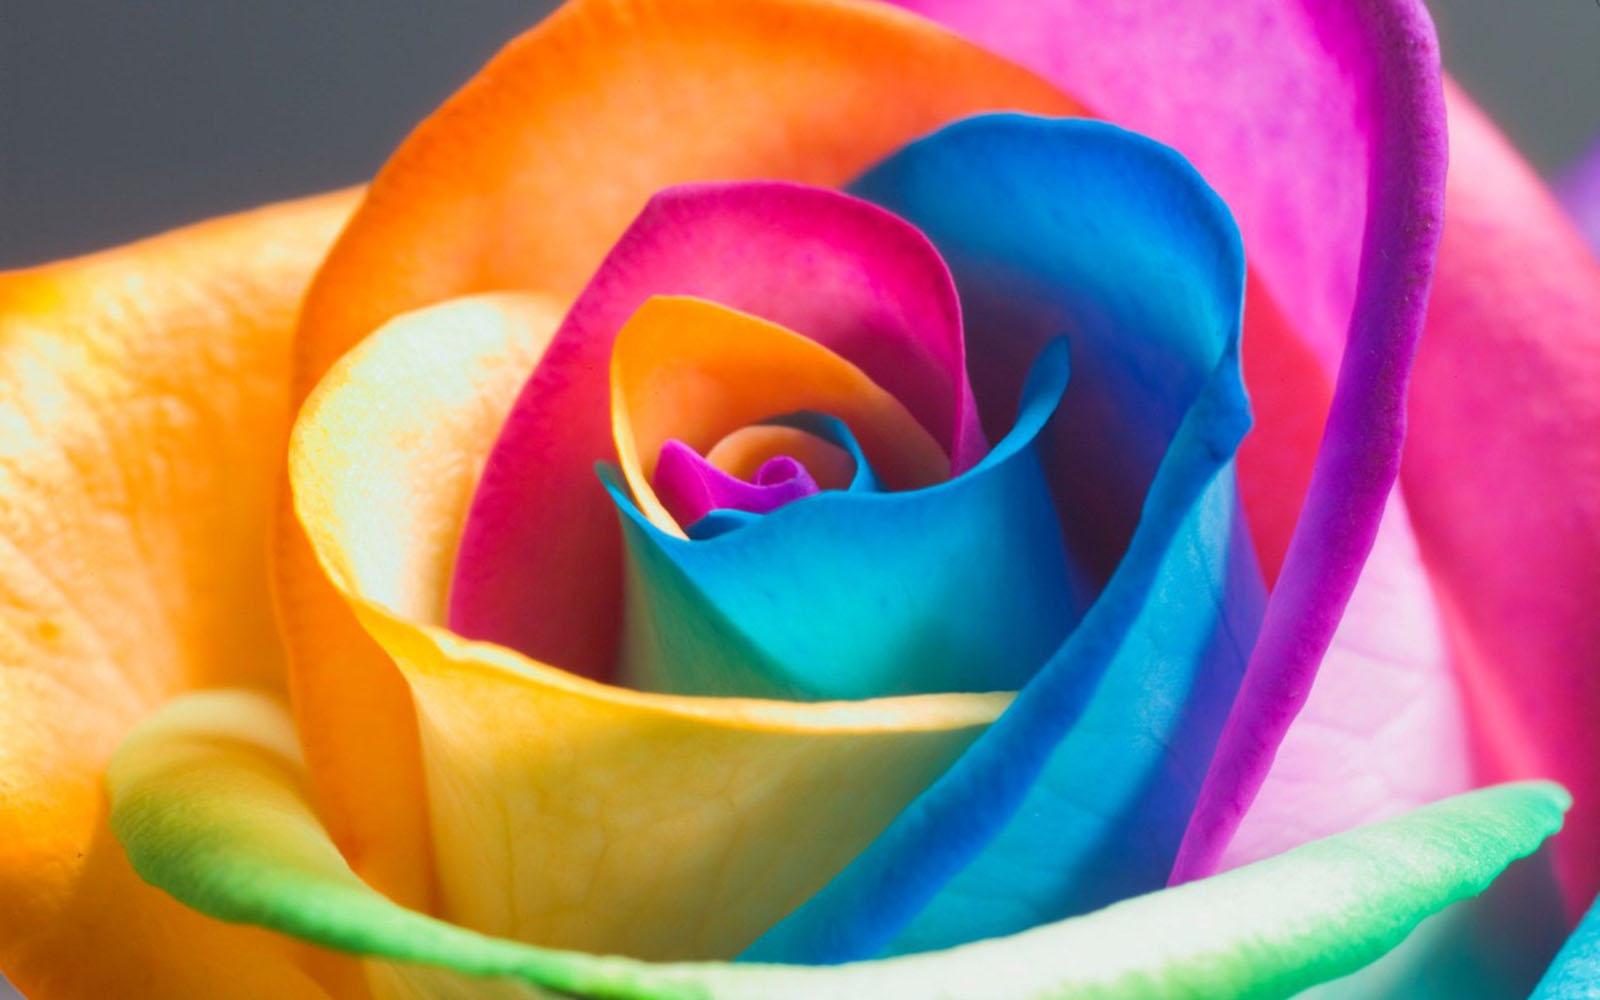 Colorful Flower Wallpaper | Desktop Wallpapers